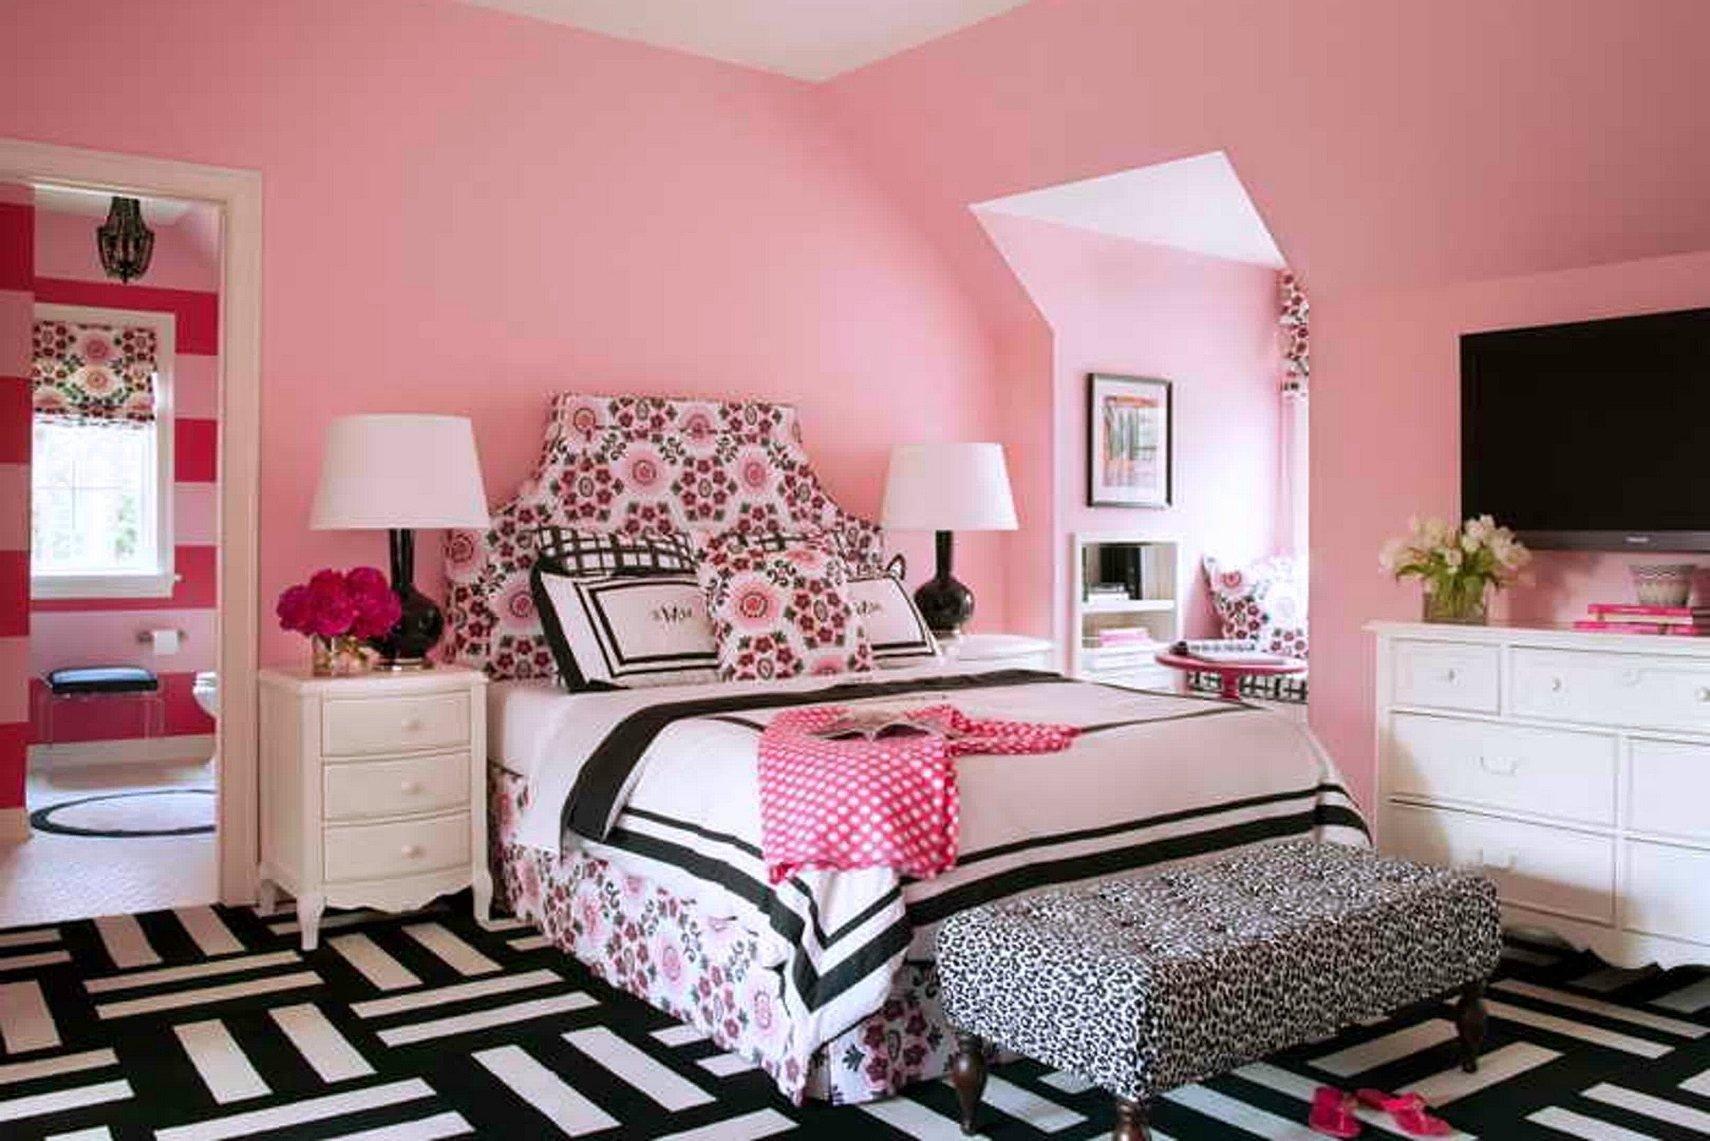 10 Fabulous Cute Room Ideas For Teenage Girls cute bedroom ideas for teenage girl design womenmisbehavin 3 2020